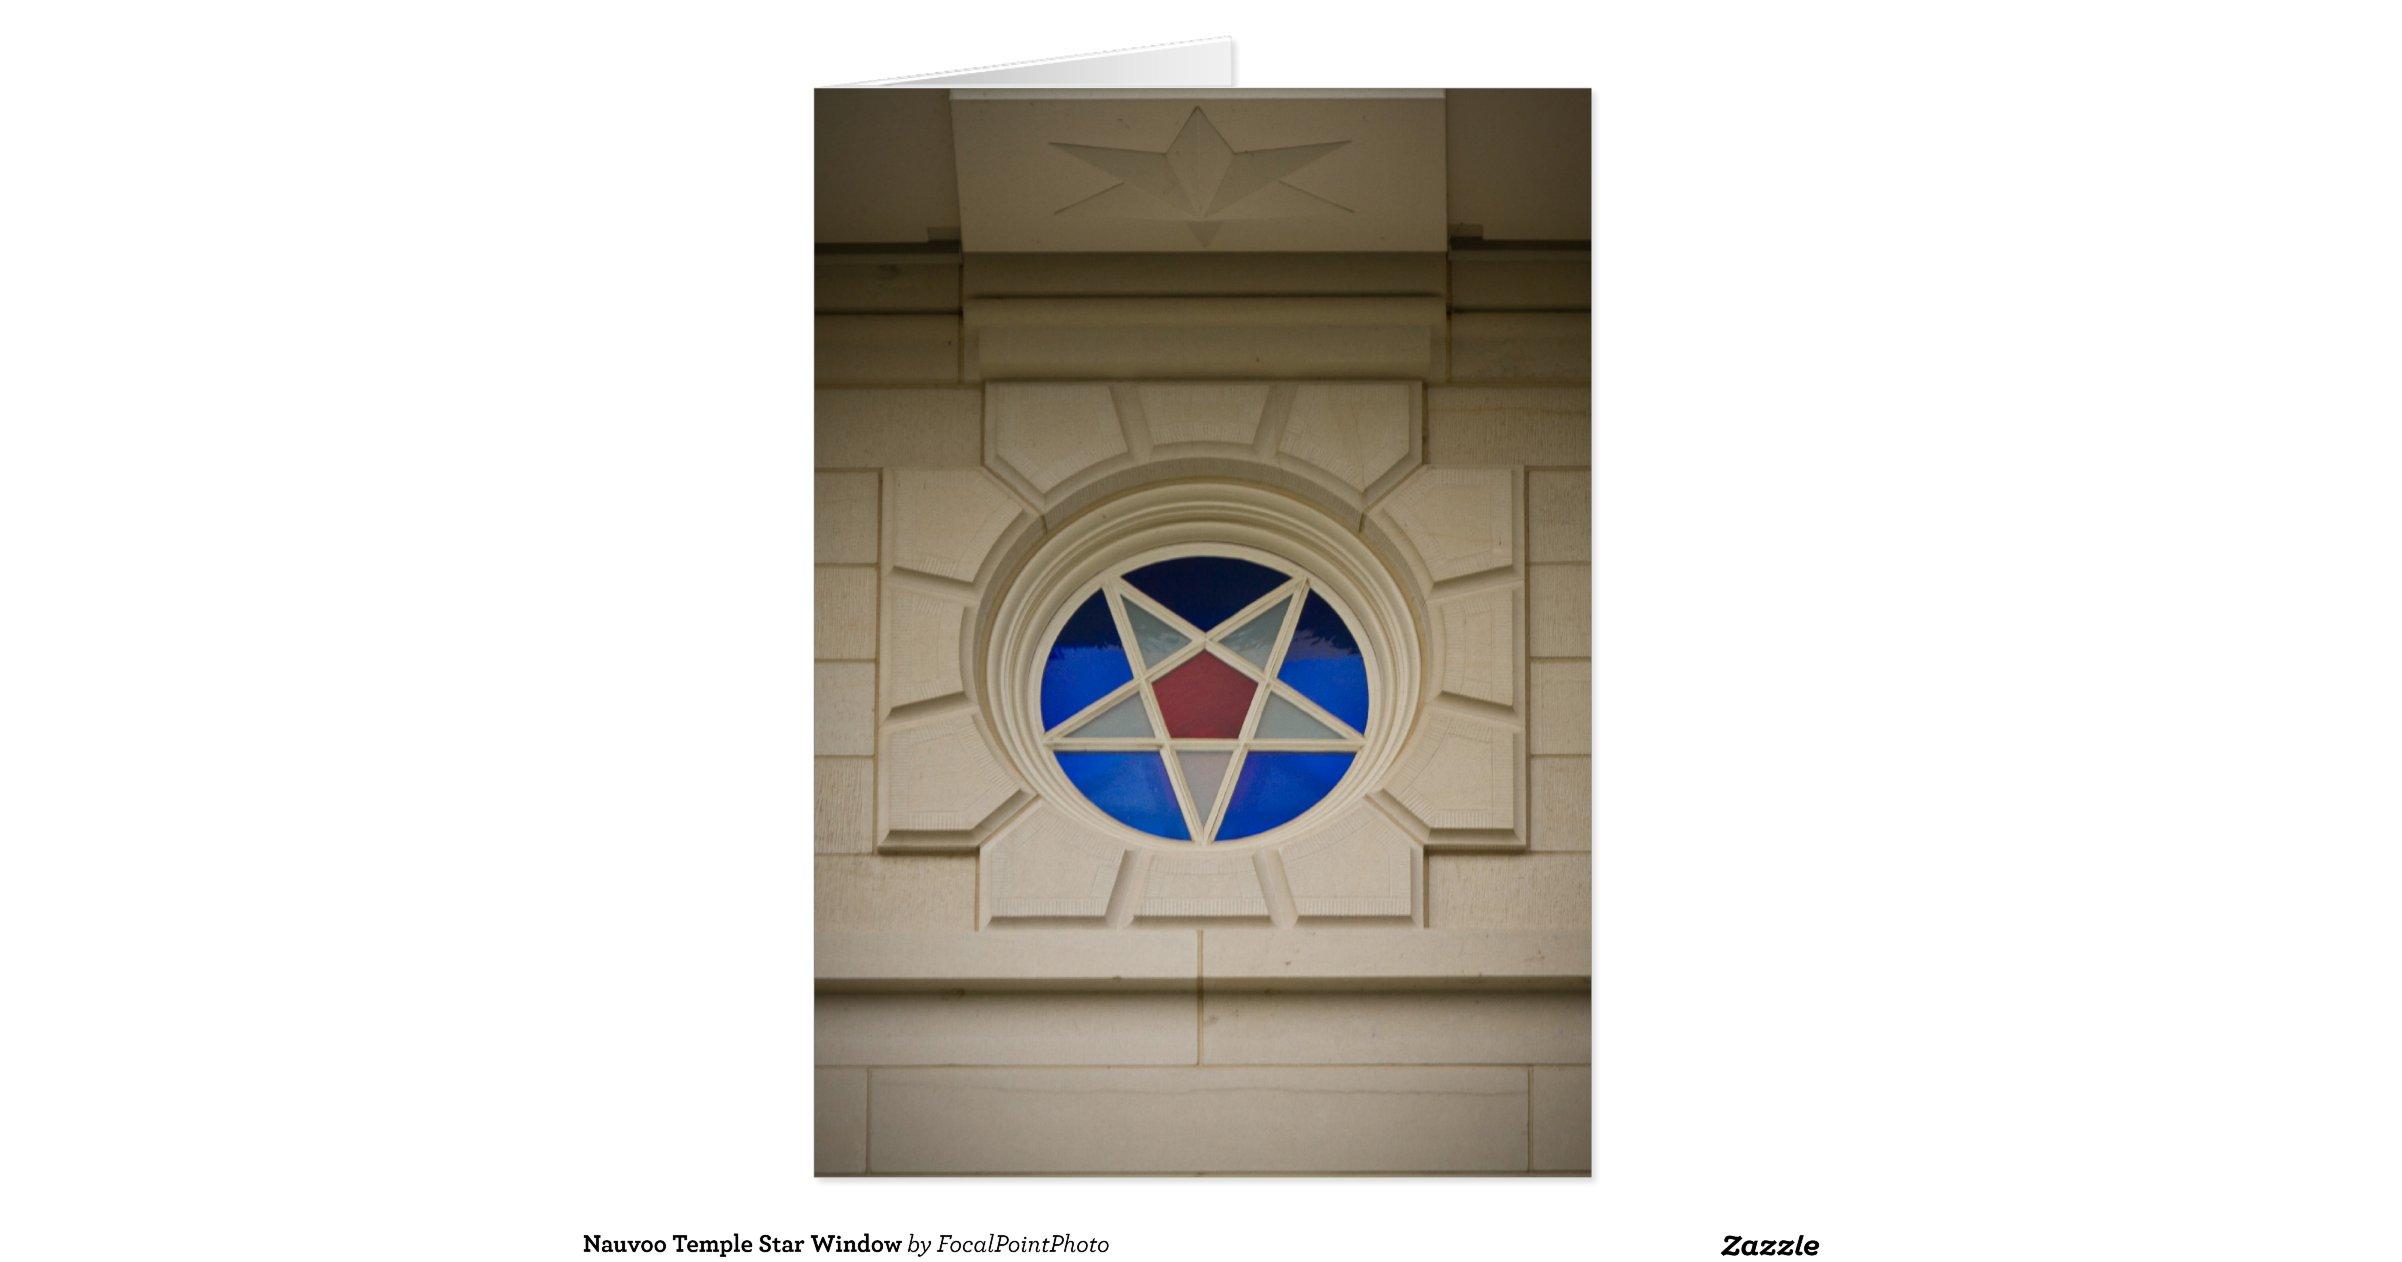 Nauvoo temple star window greeting card zazzle for 5 star windows